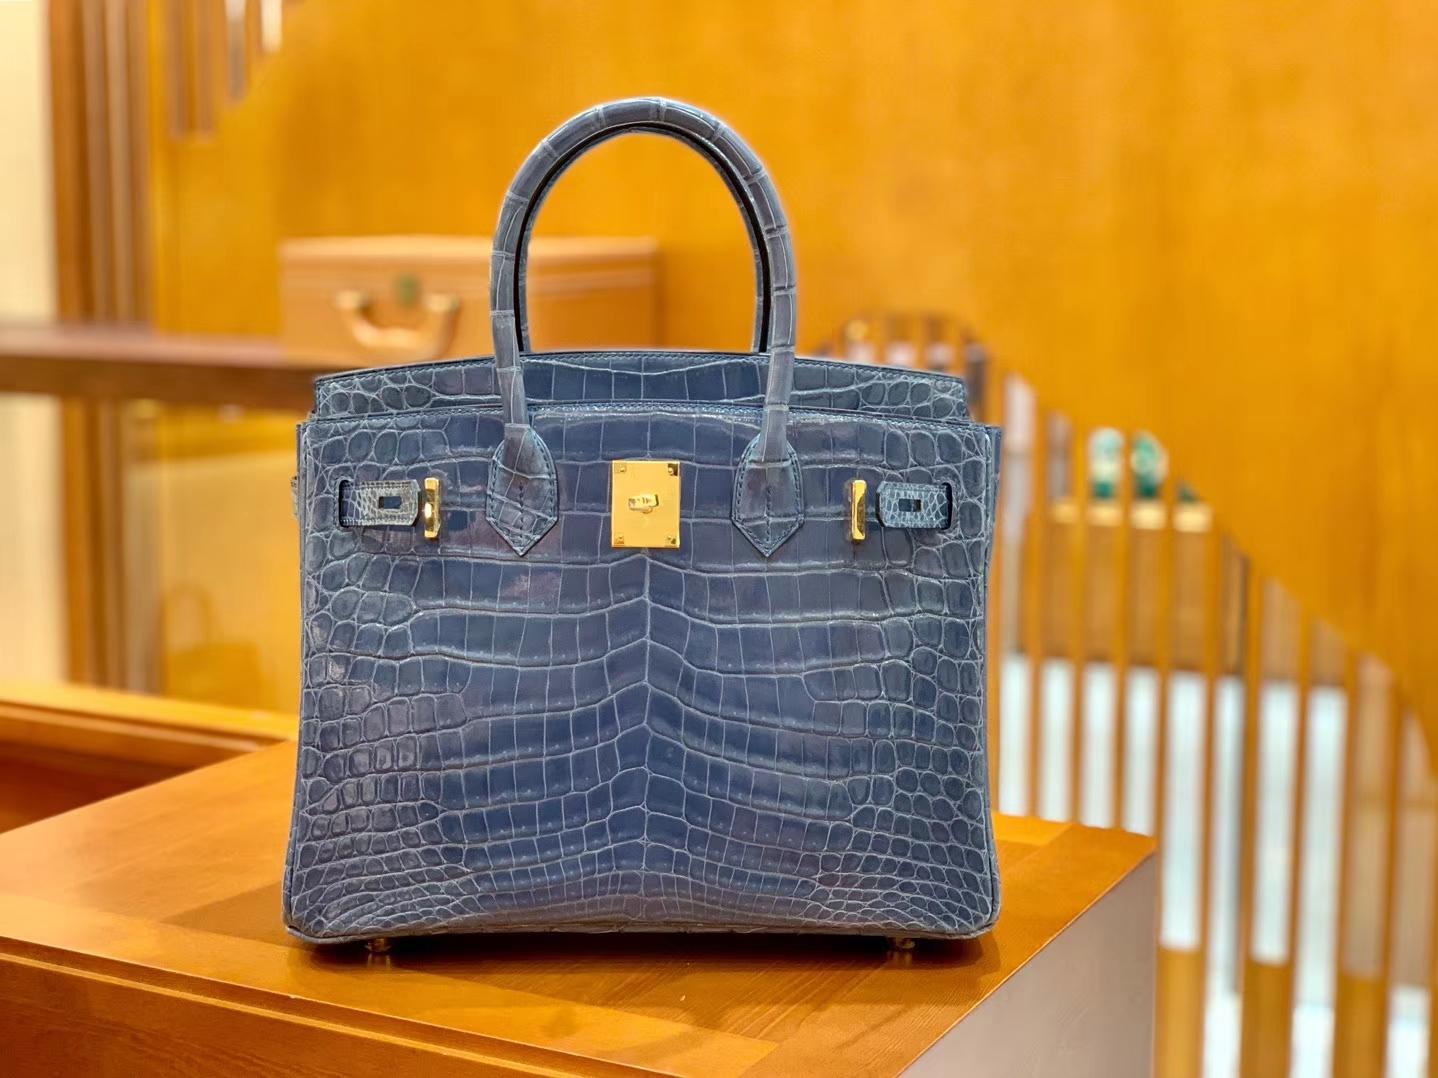 Hermès(爱马仕)Birkin 30cm 牛仔蓝 金扣 一级皮 尼罗鳄鱼皮 臻品级别